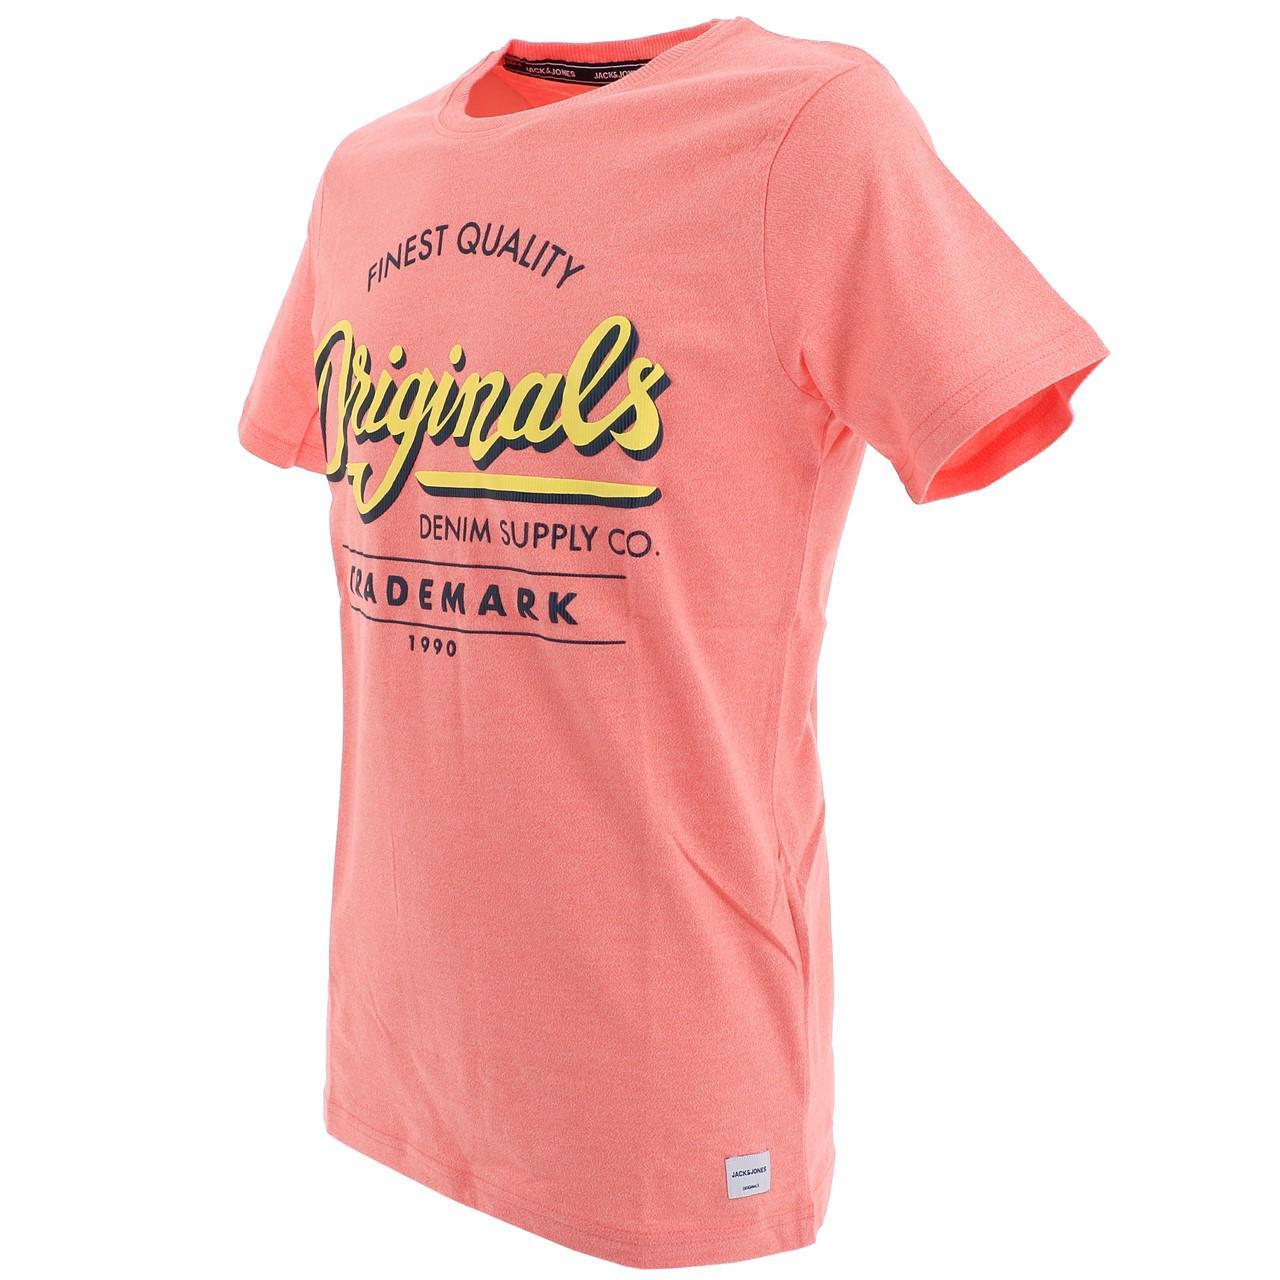 Short-Sleeve-T-Shirt-Jack-and-Jones-Quinn-Persimmon-Mc-Tee-Orange-18539-N thumbnail 4